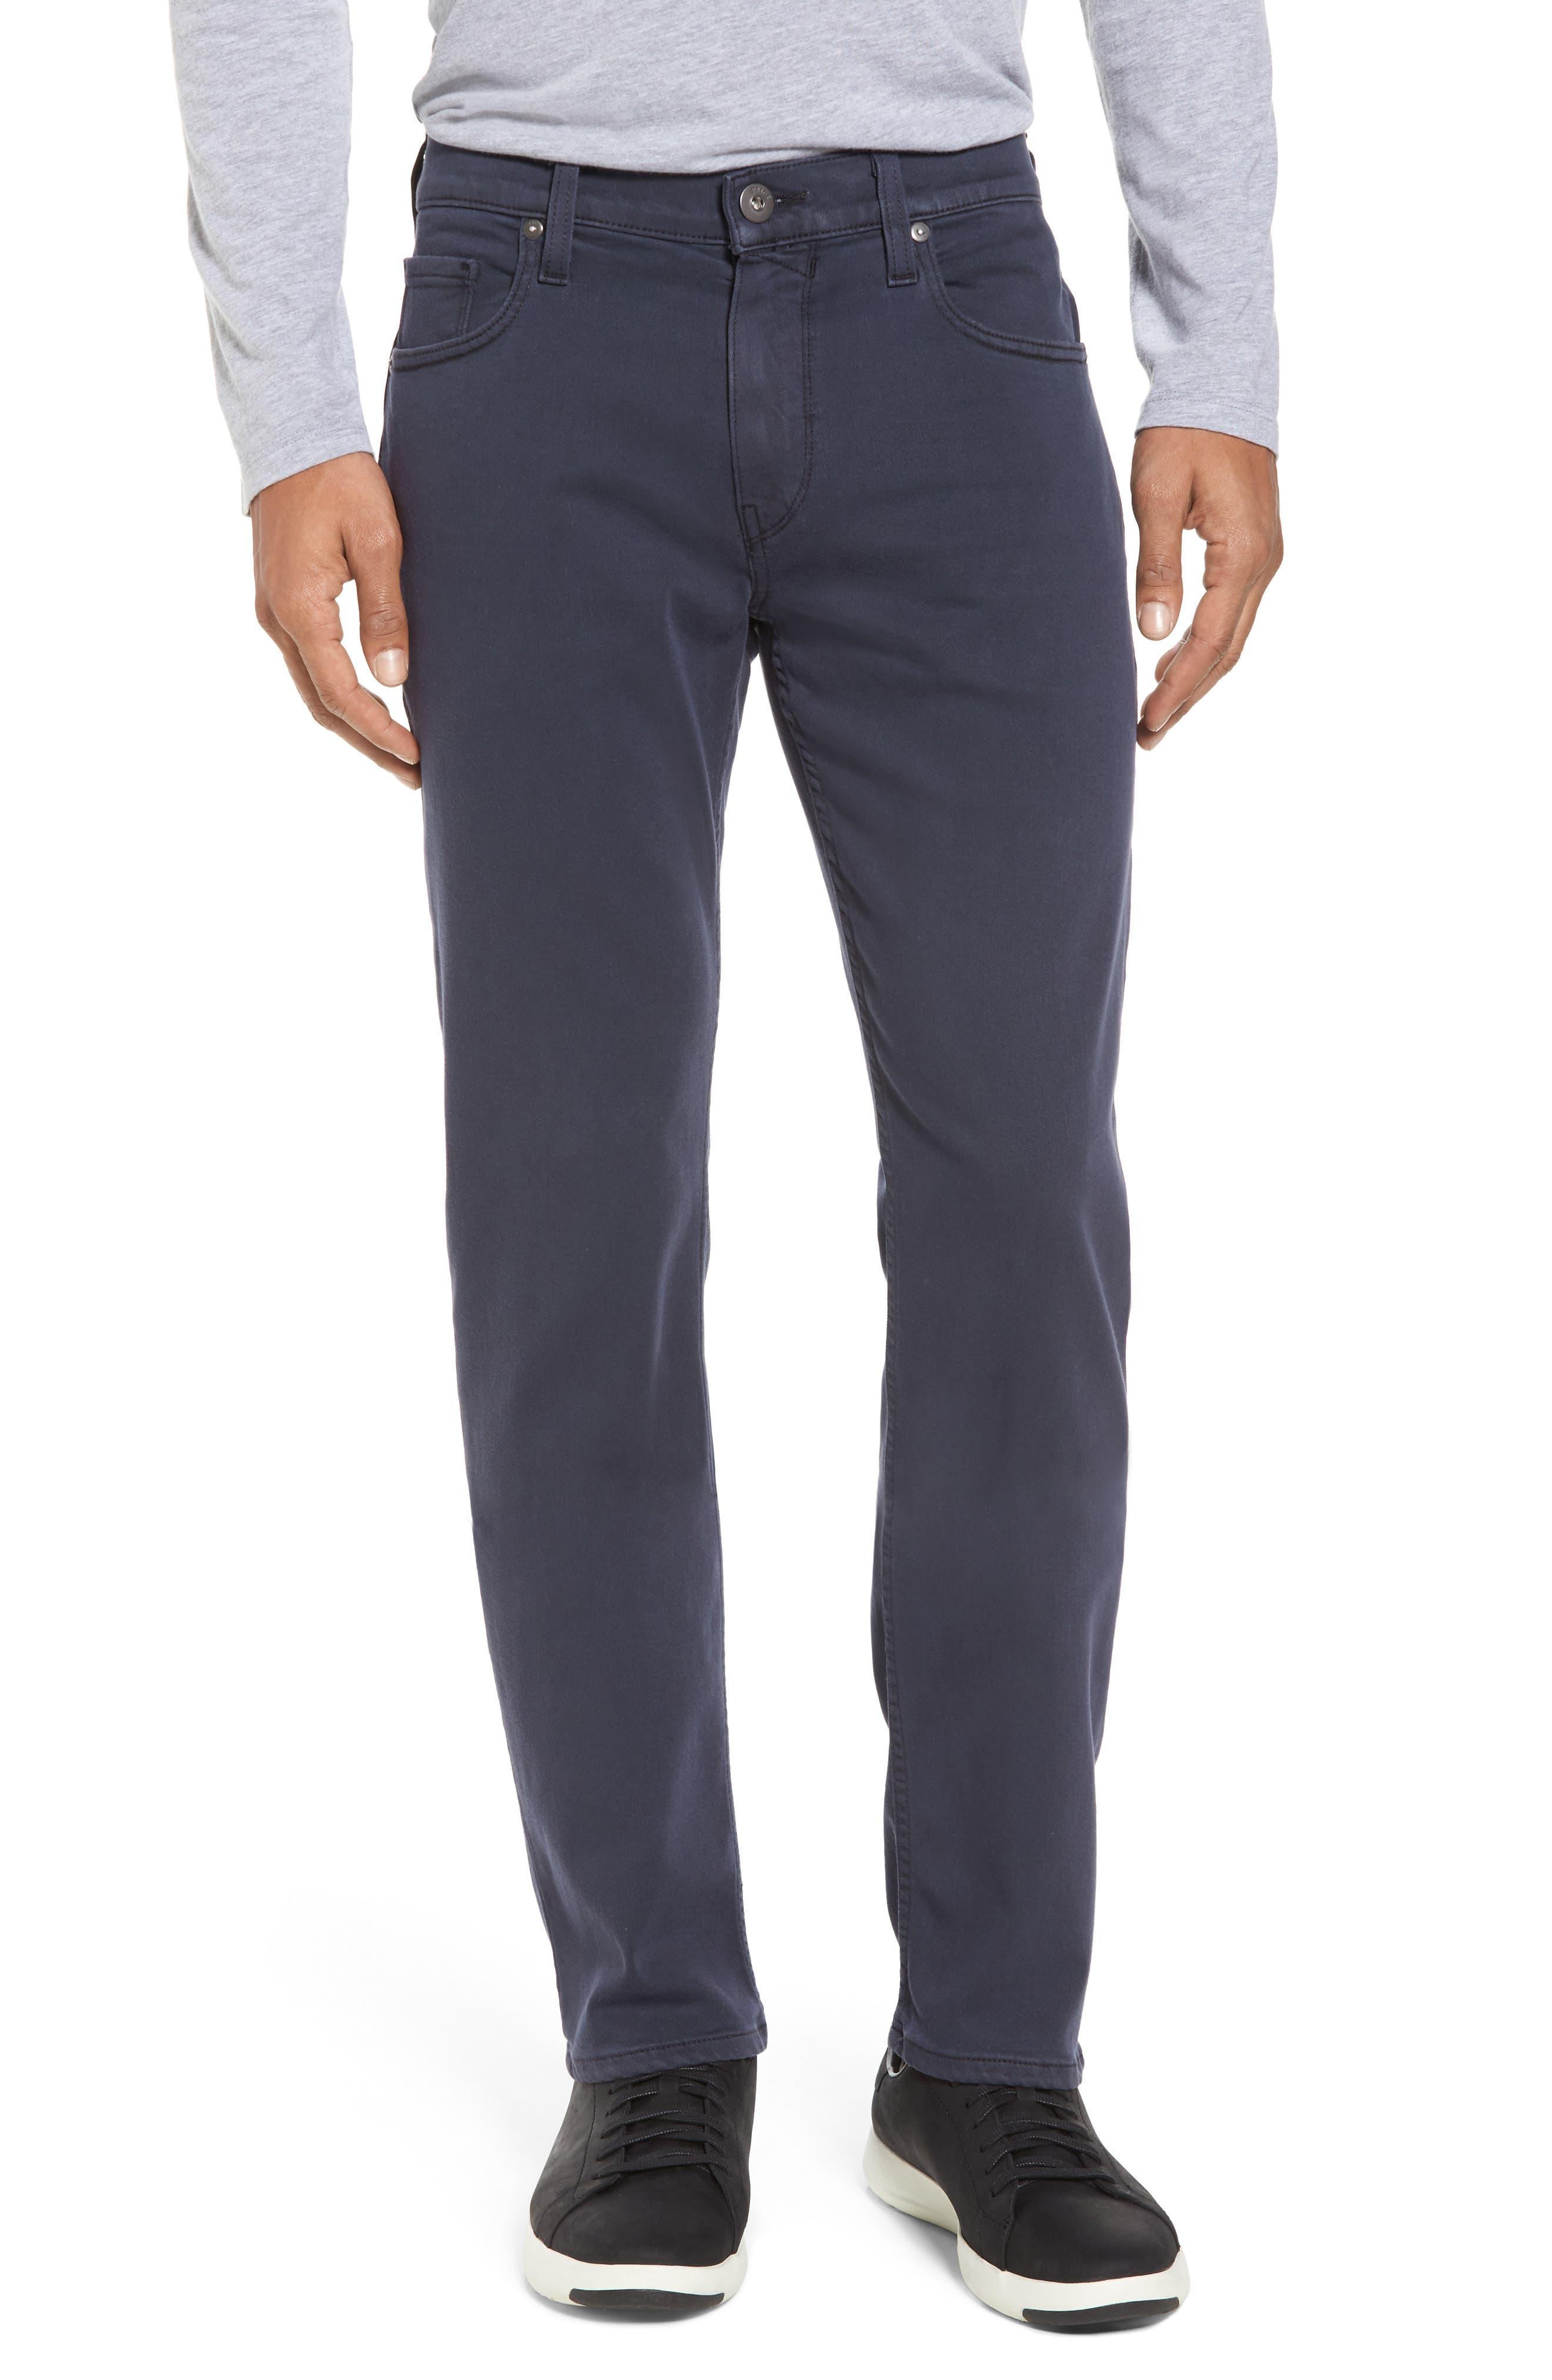 Transcend - Federal Slim Straight Leg Jeans,                             Main thumbnail 1, color,                             400